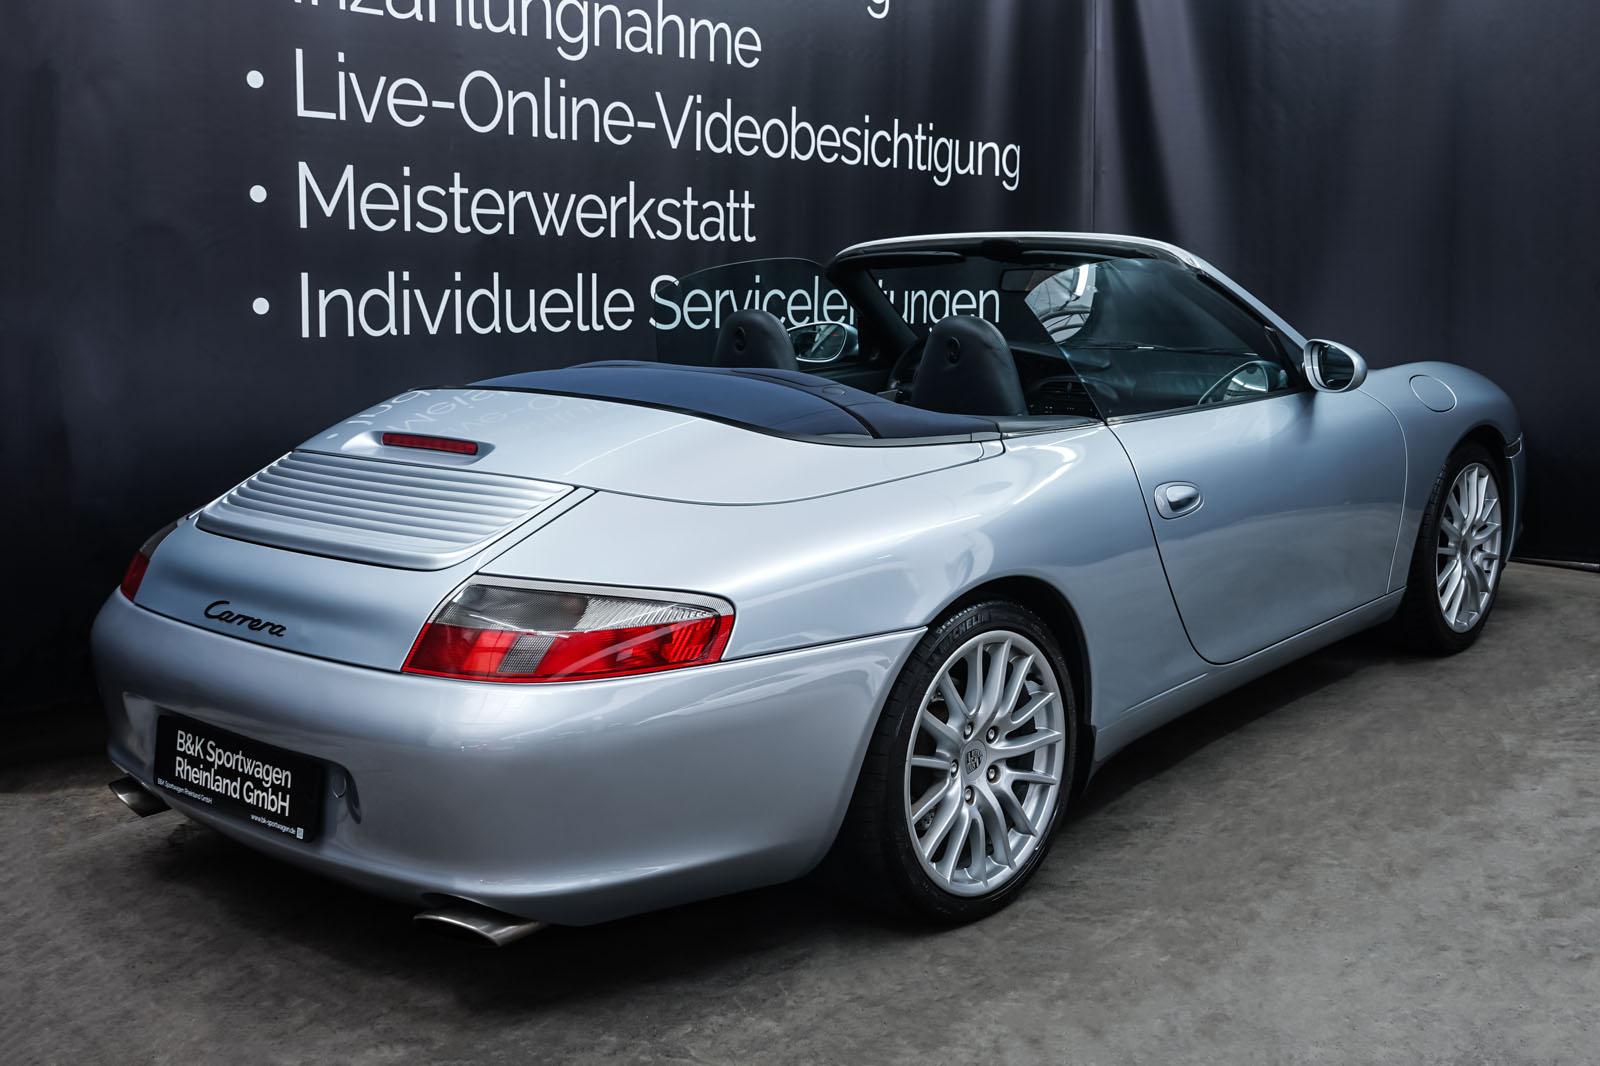 Porsche_996_Cabrio_Silber_Dunkelblau_POR-1724_17_w